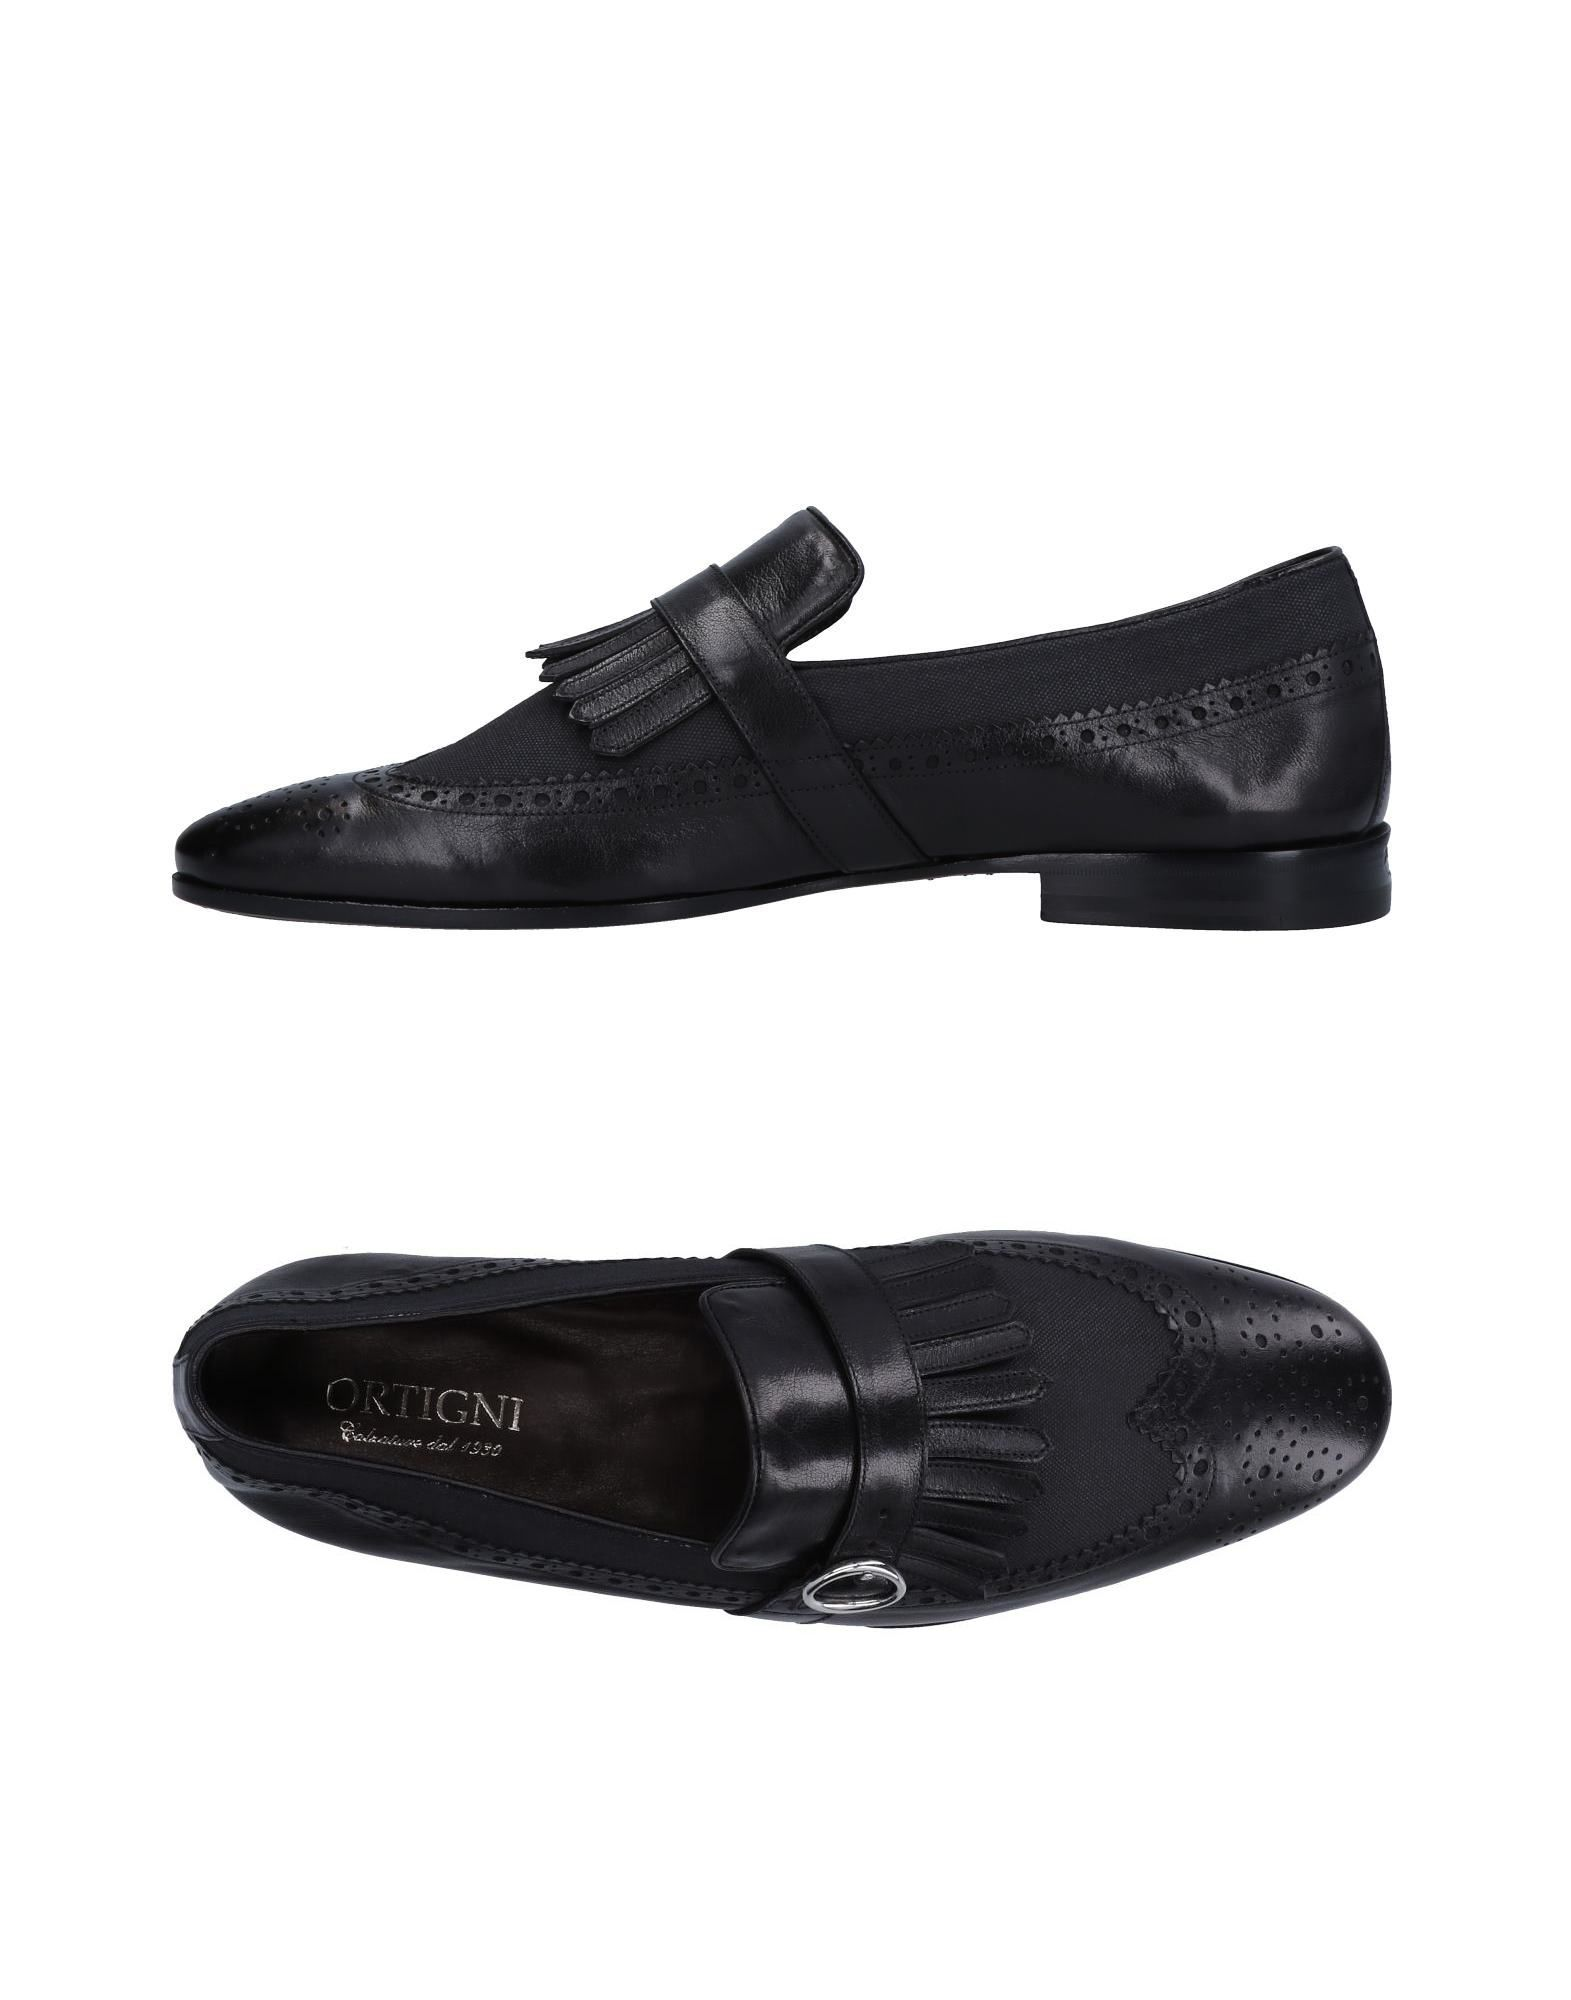 Ortigni Mokassins Herren  11515444GJ Gute Qualität beliebte Schuhe